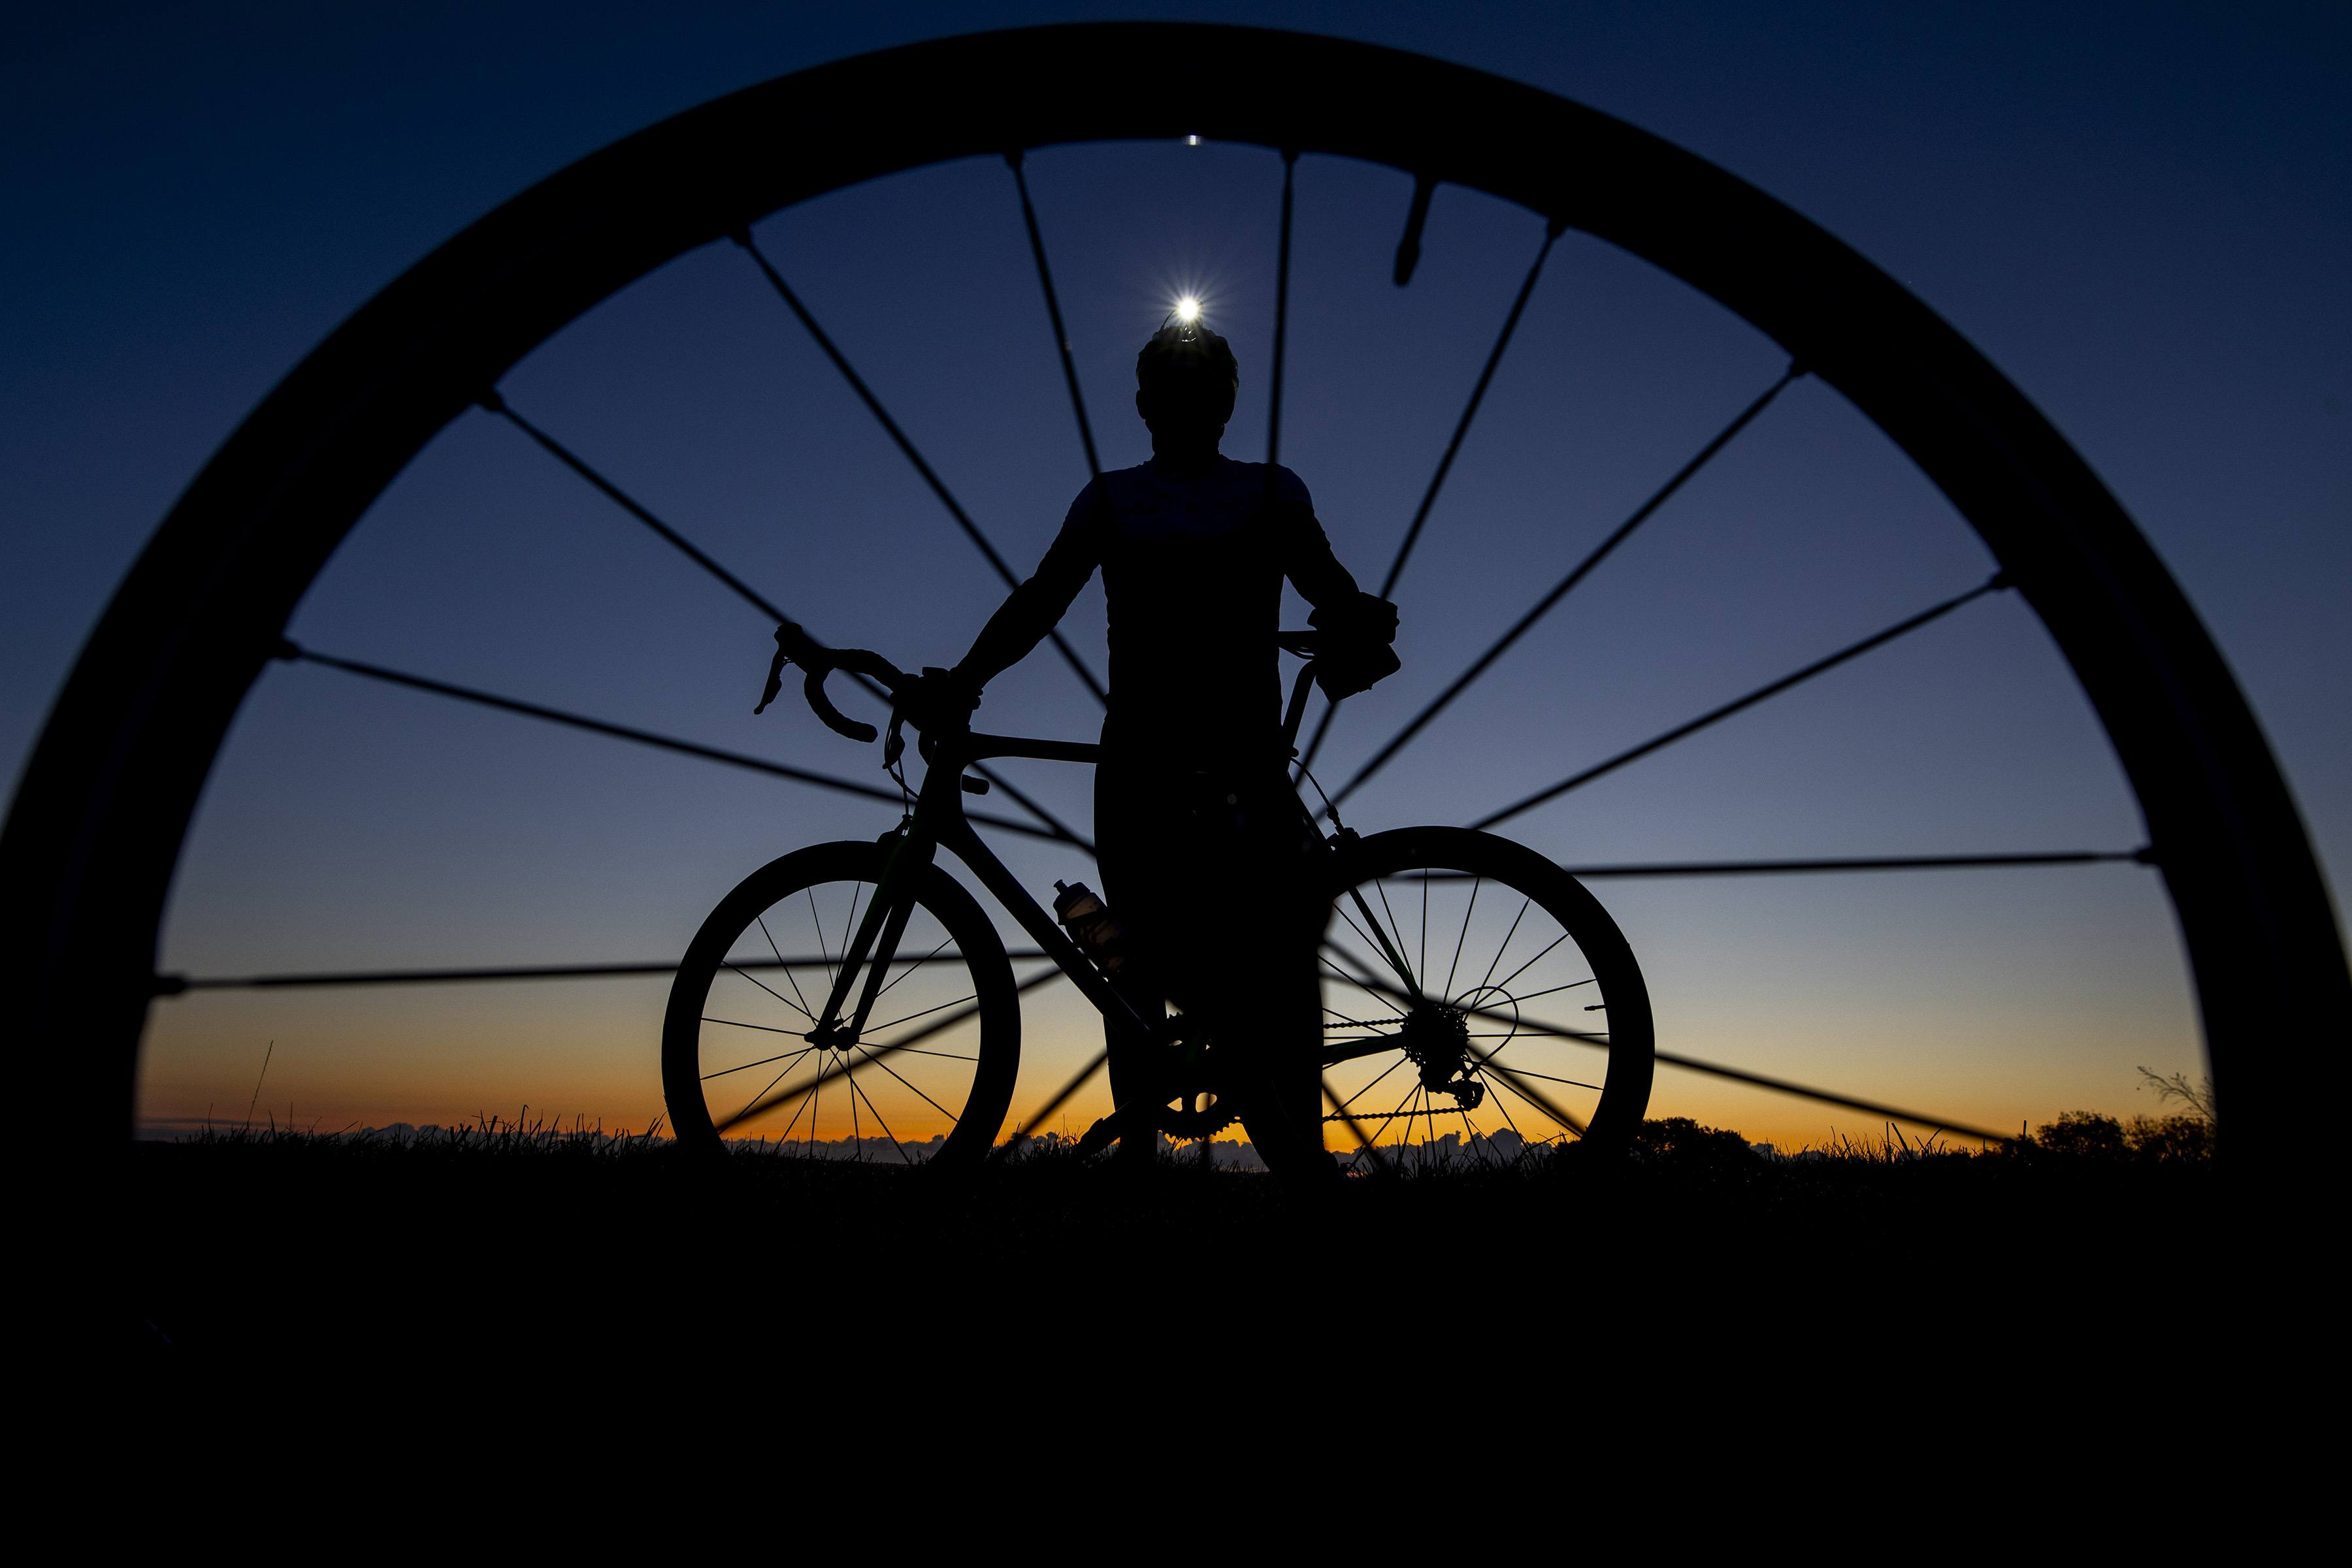 NO FEE INTEL CYCLE